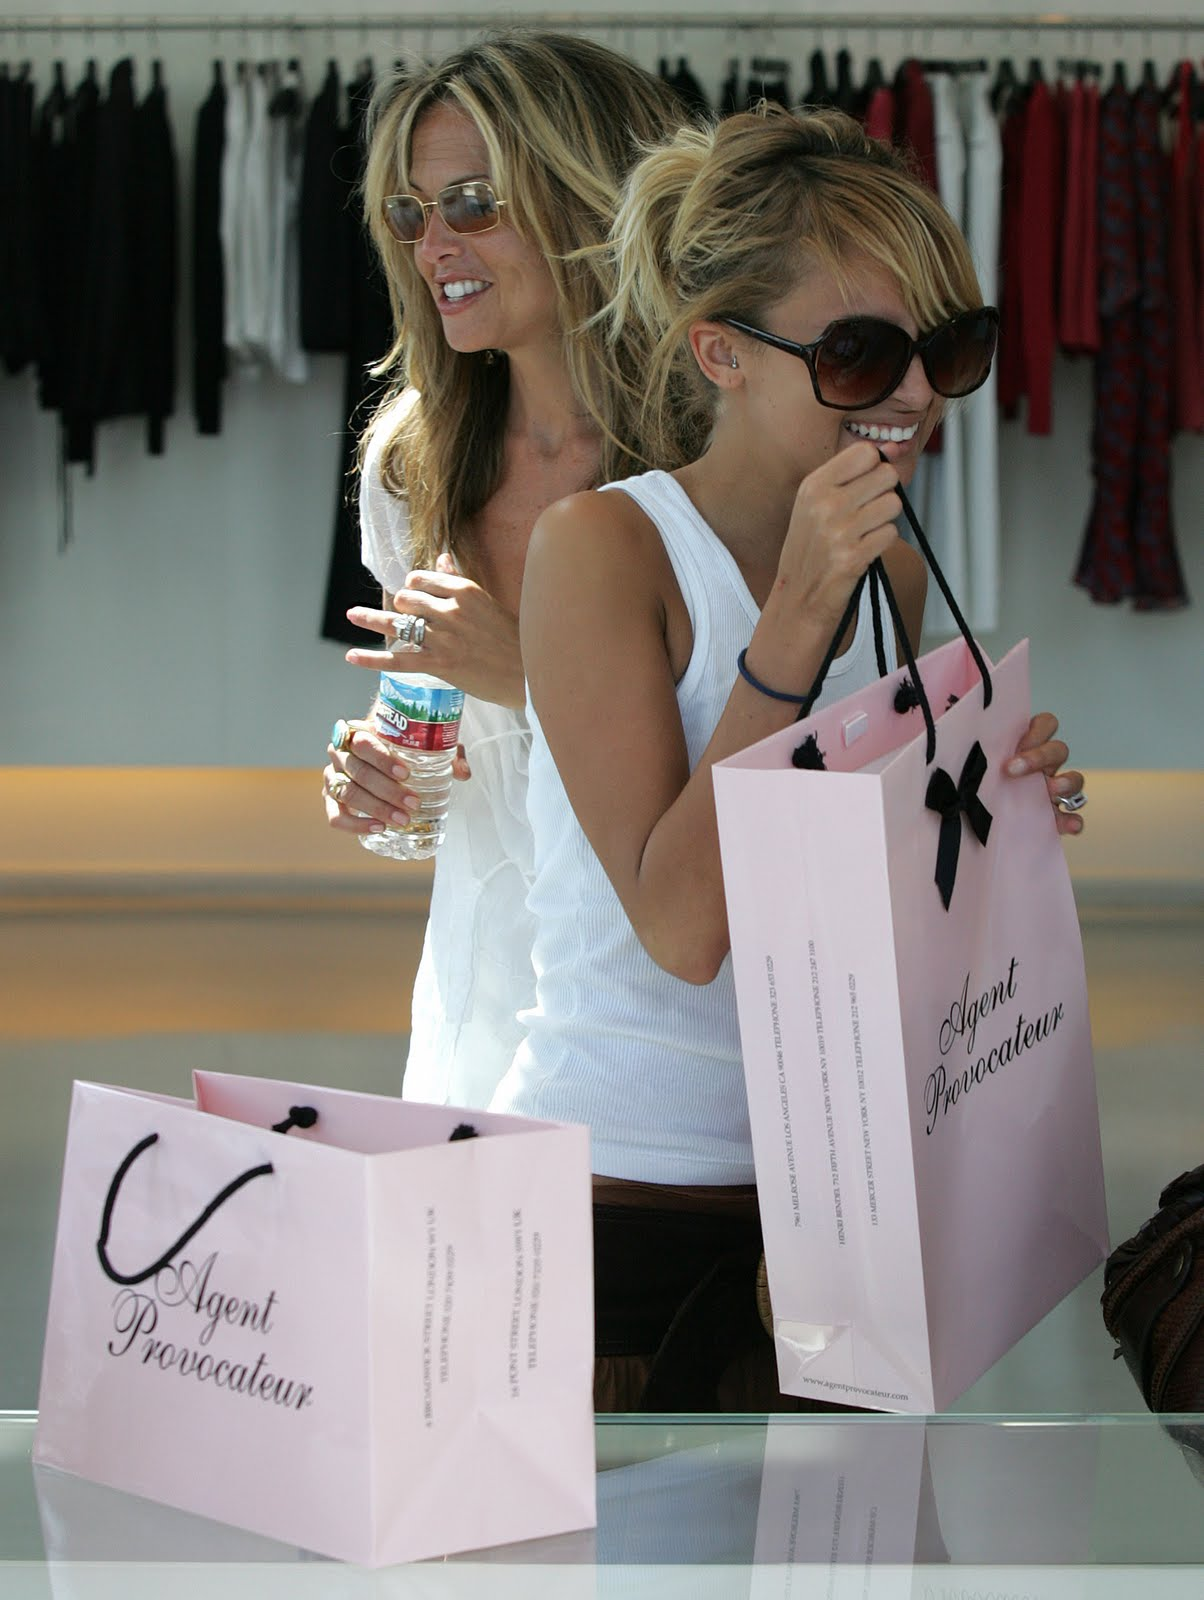 http://1.bp.blogspot.com/_ygRAqJeep-s/TFiJVX3VXKI/AAAAAAAAGdc/iLBIaxkBvl0/s1600/Nicole_Richie_shopping.jpg